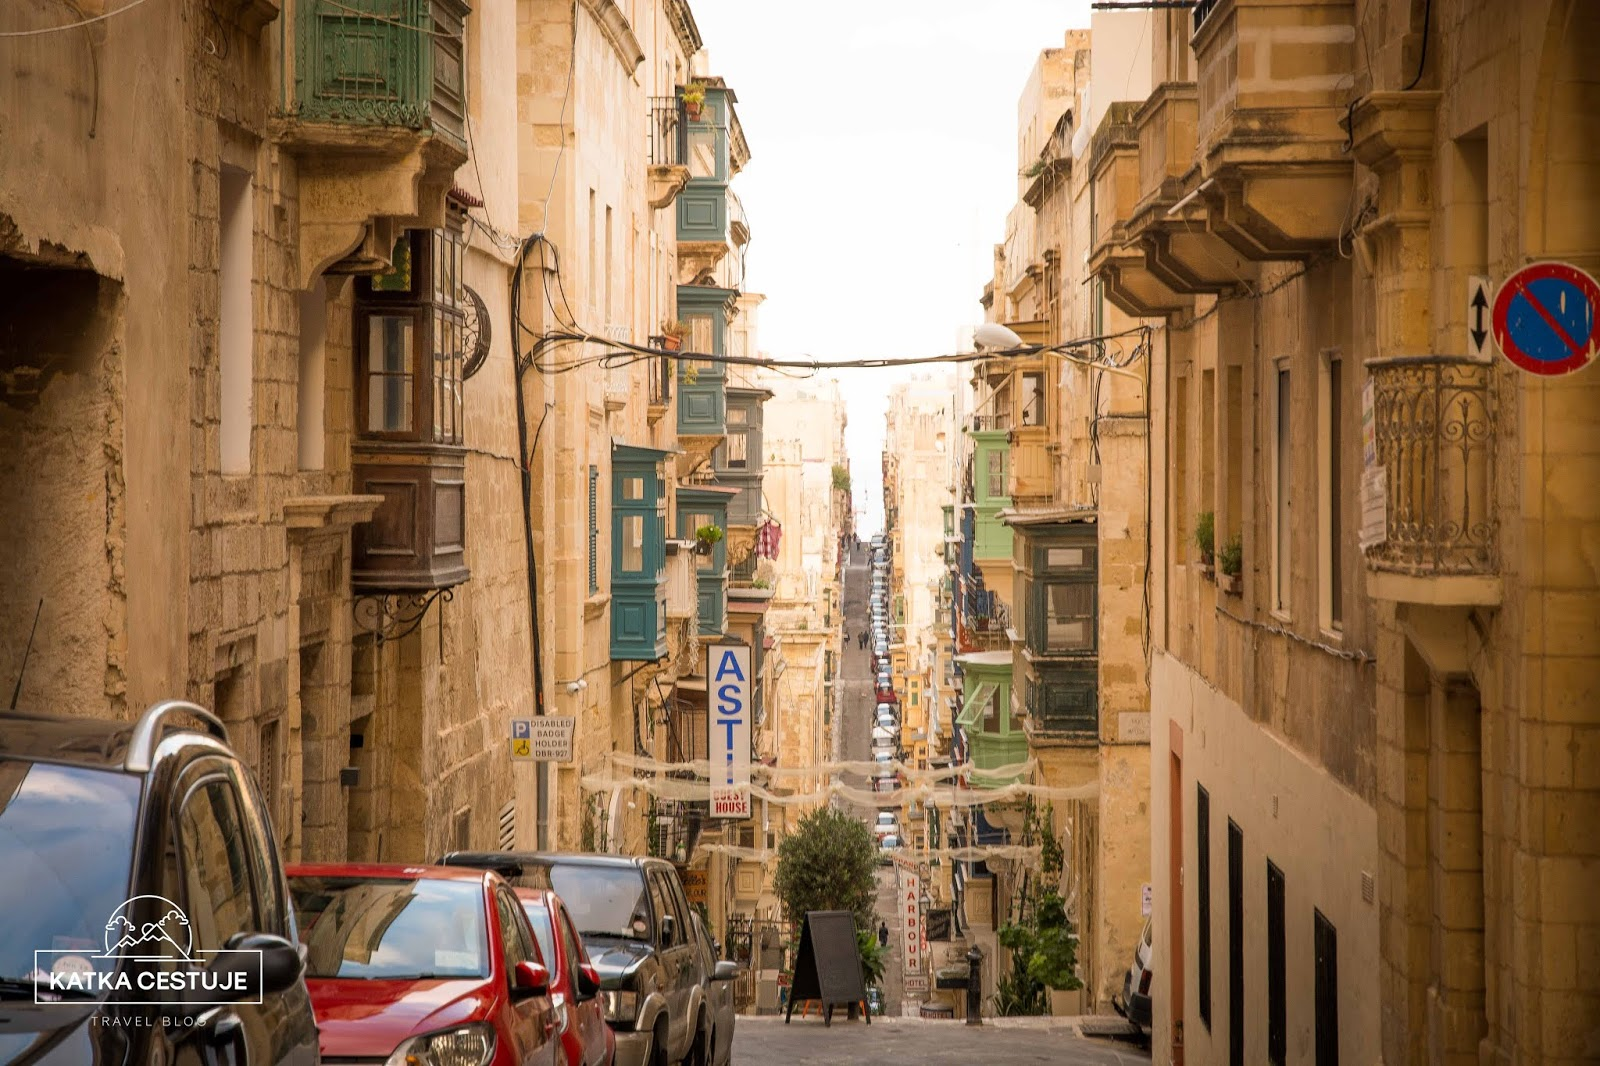 historicke mestecko Valetta kouzelna ulicka malta